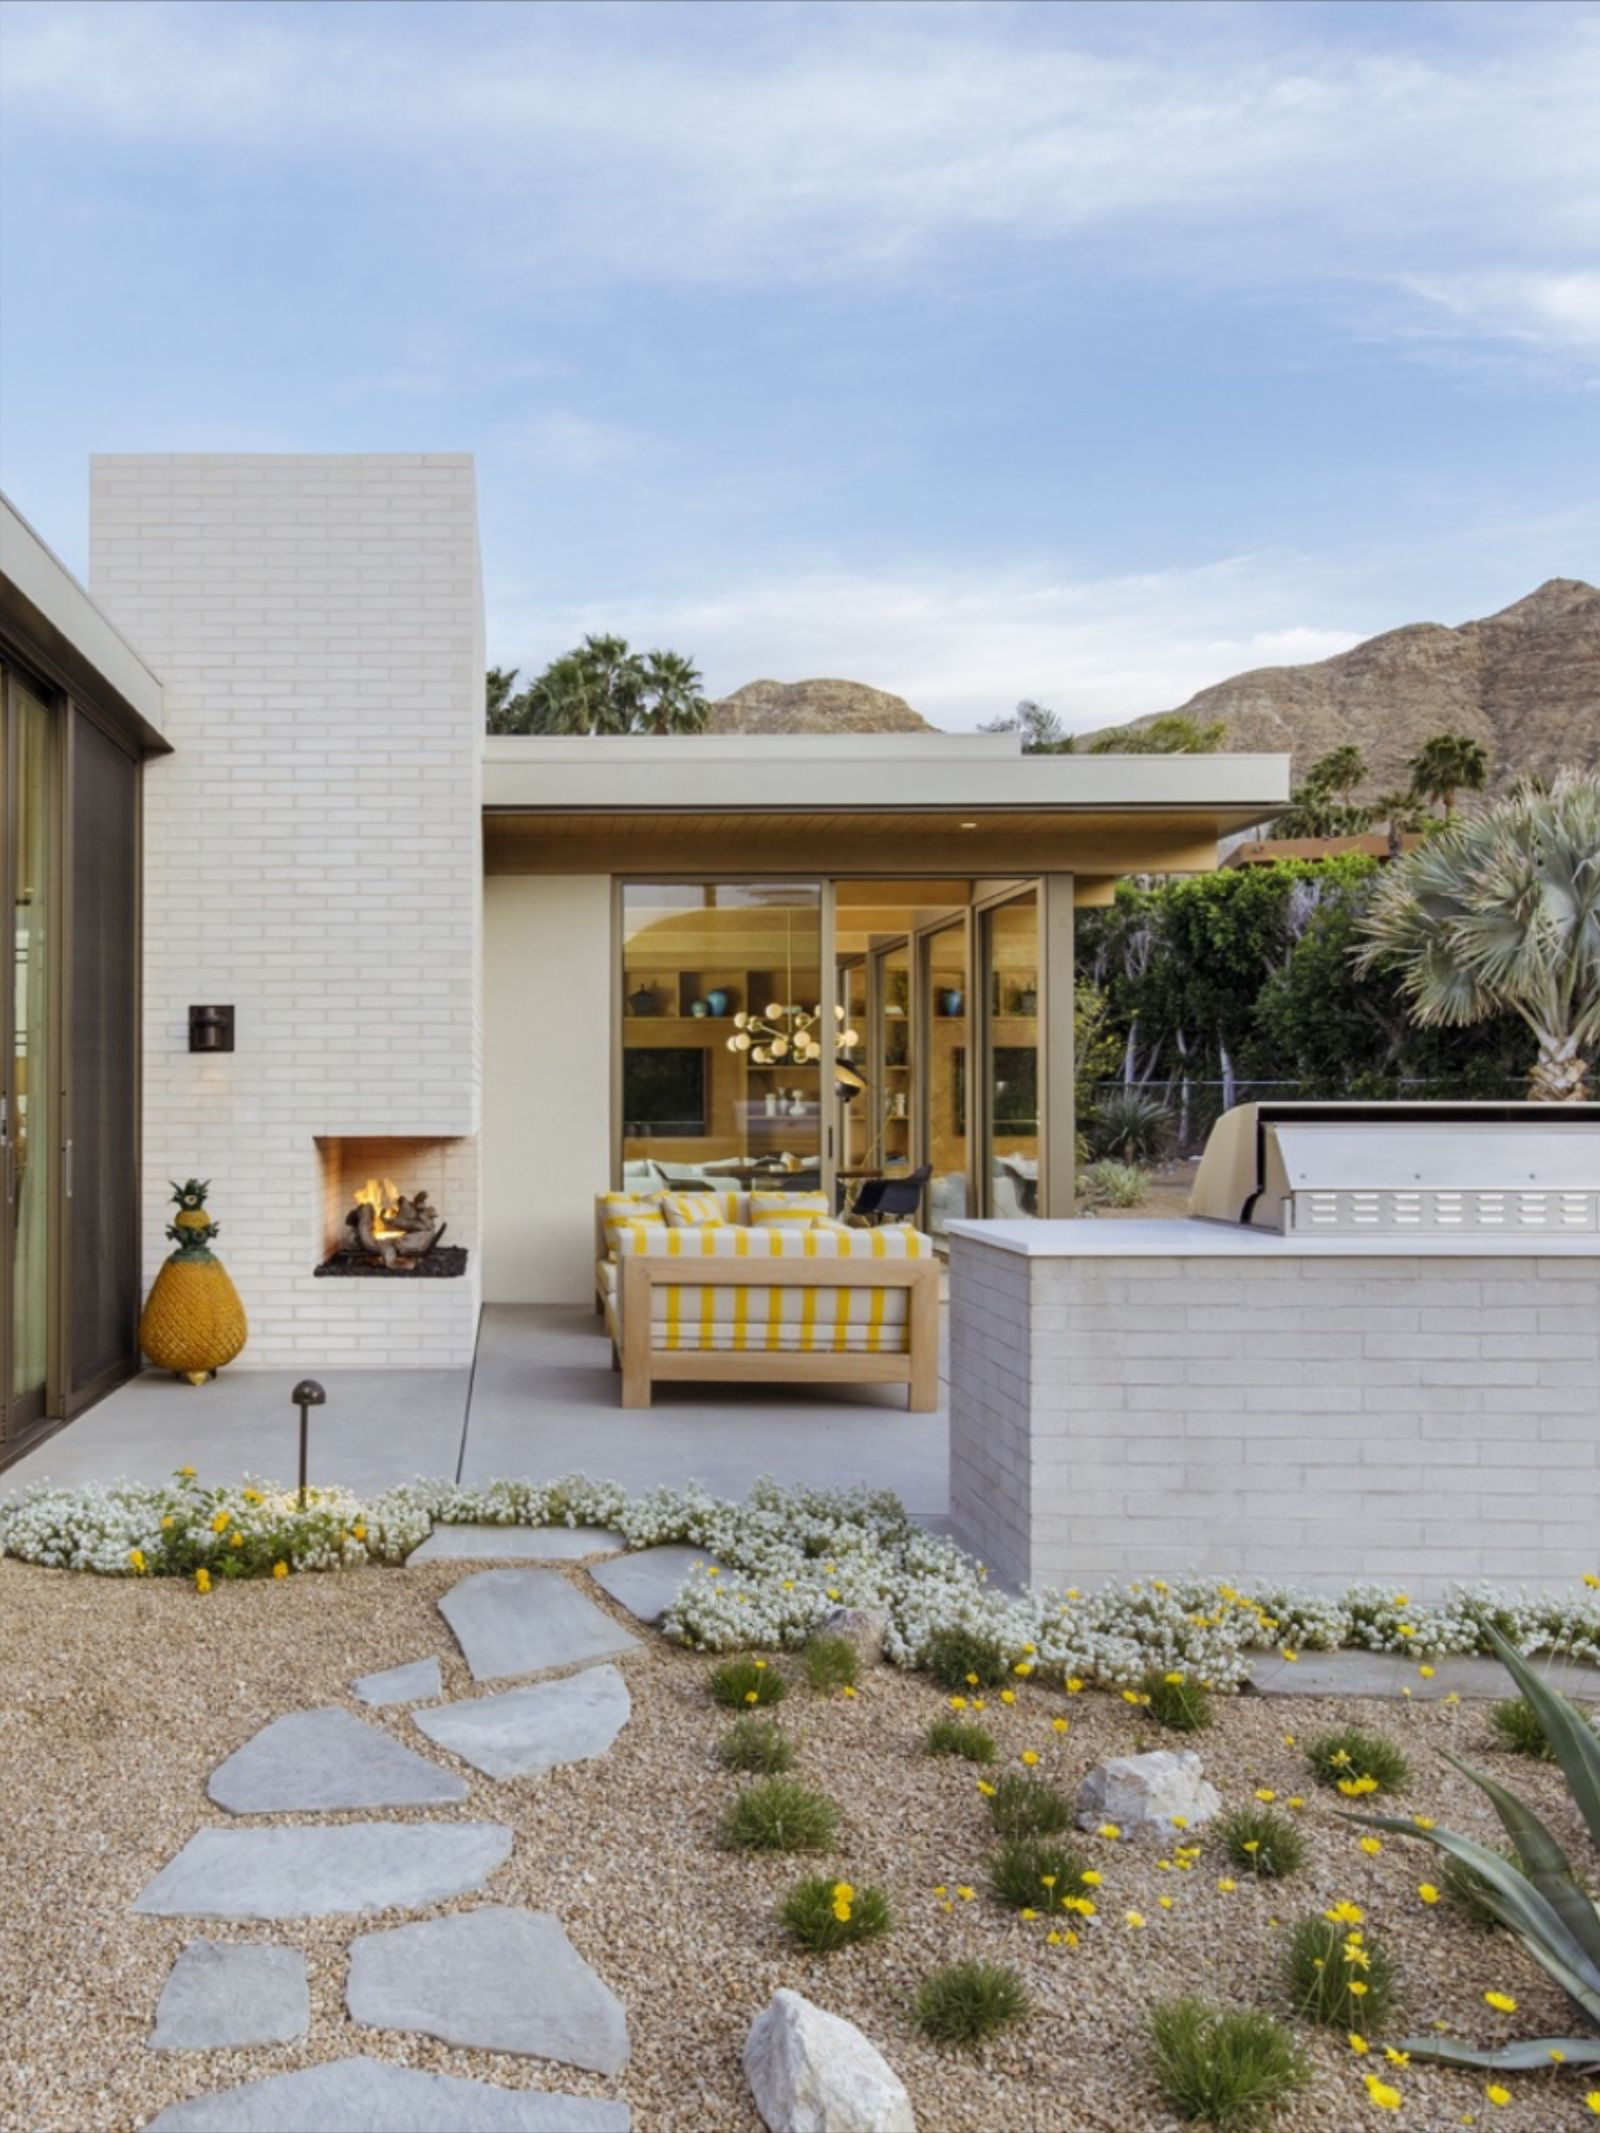 Terrace At Thunderbird Heights Residence Near Palm Springs Residences Flagstone Pathway Mid Century Modern House